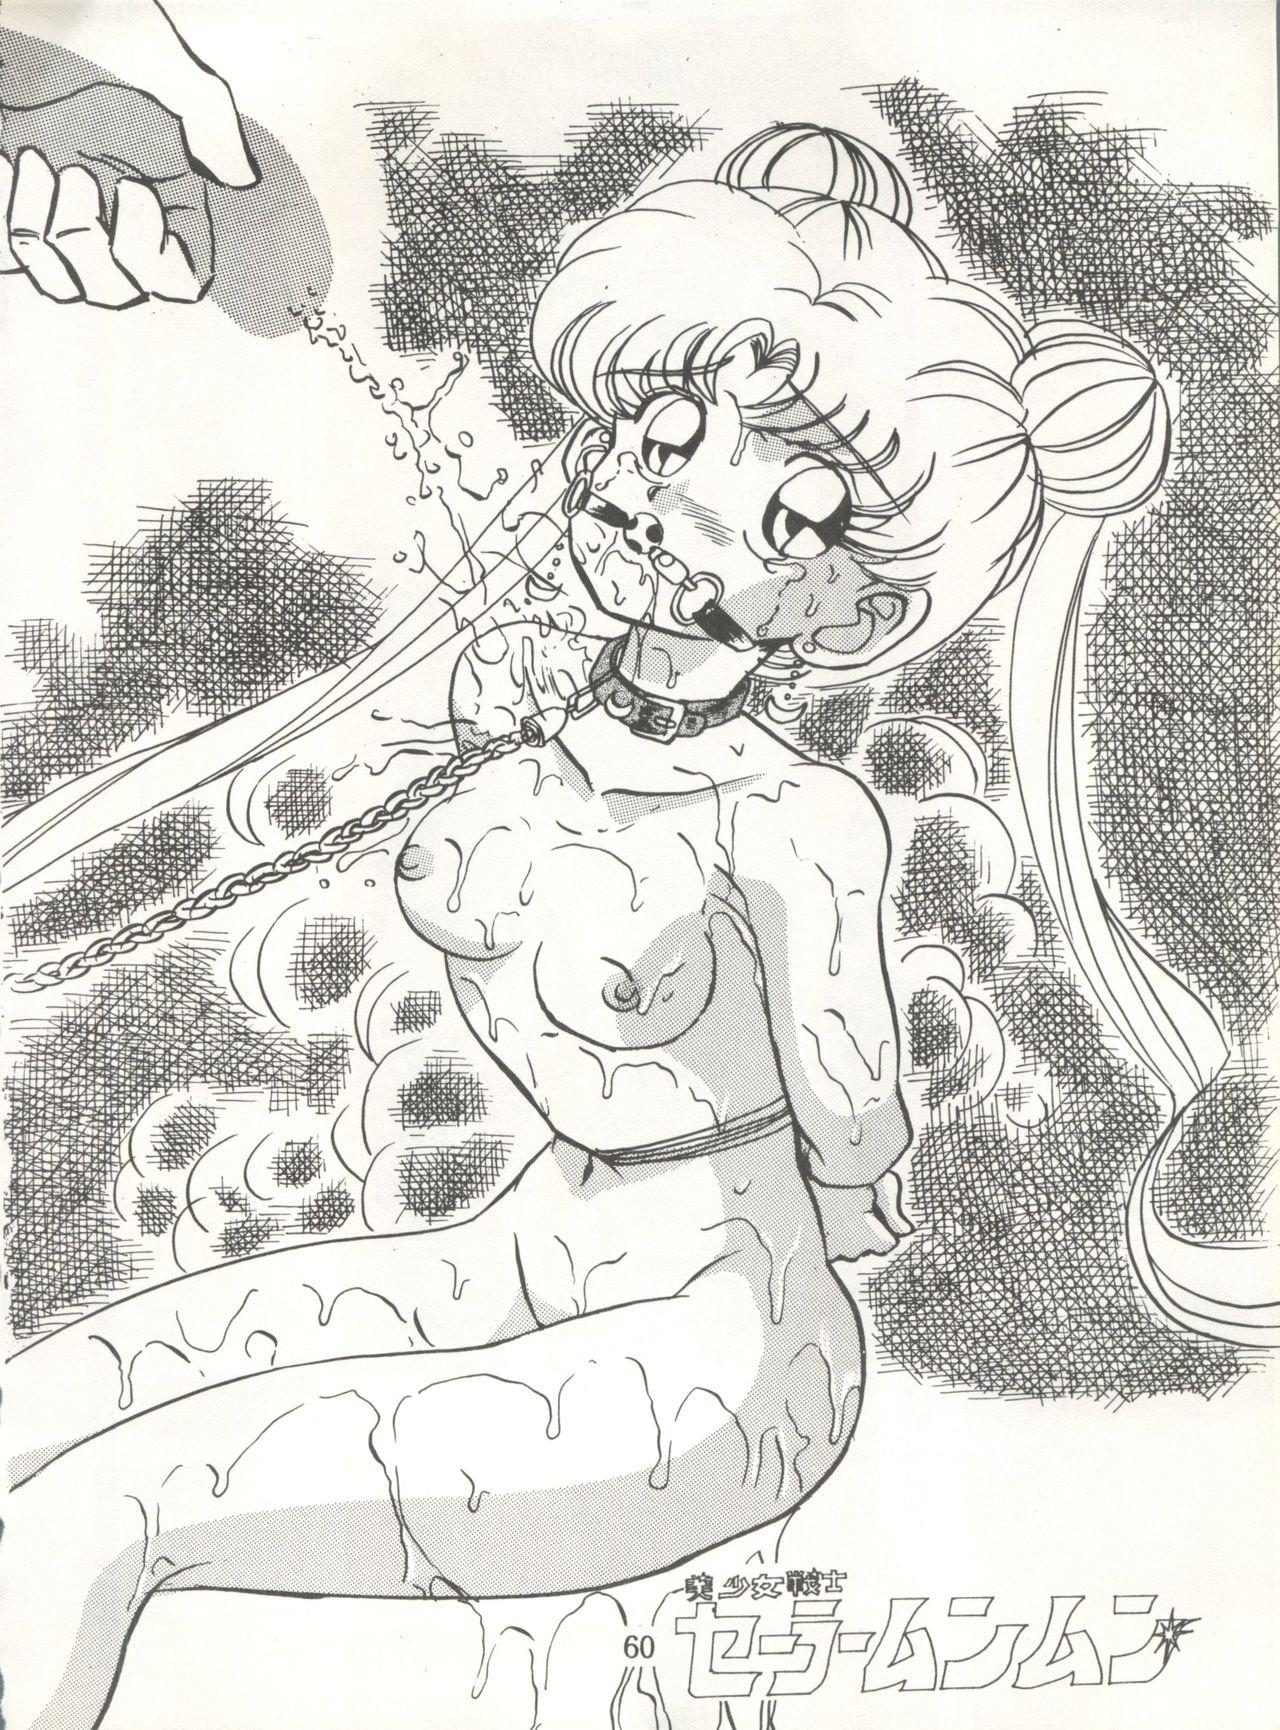 [Global One (MARO)] Sadistic 5 (Cutey Honey, Devilman, Sailor Moon), [Global One (MARO)] Sadistic (Dirty Pair, Fushigi no Umi no Nadia, Sailor Moon), [Studio Ikkatsumajin] .ribbon (Hime-chan's Ribbon) 119